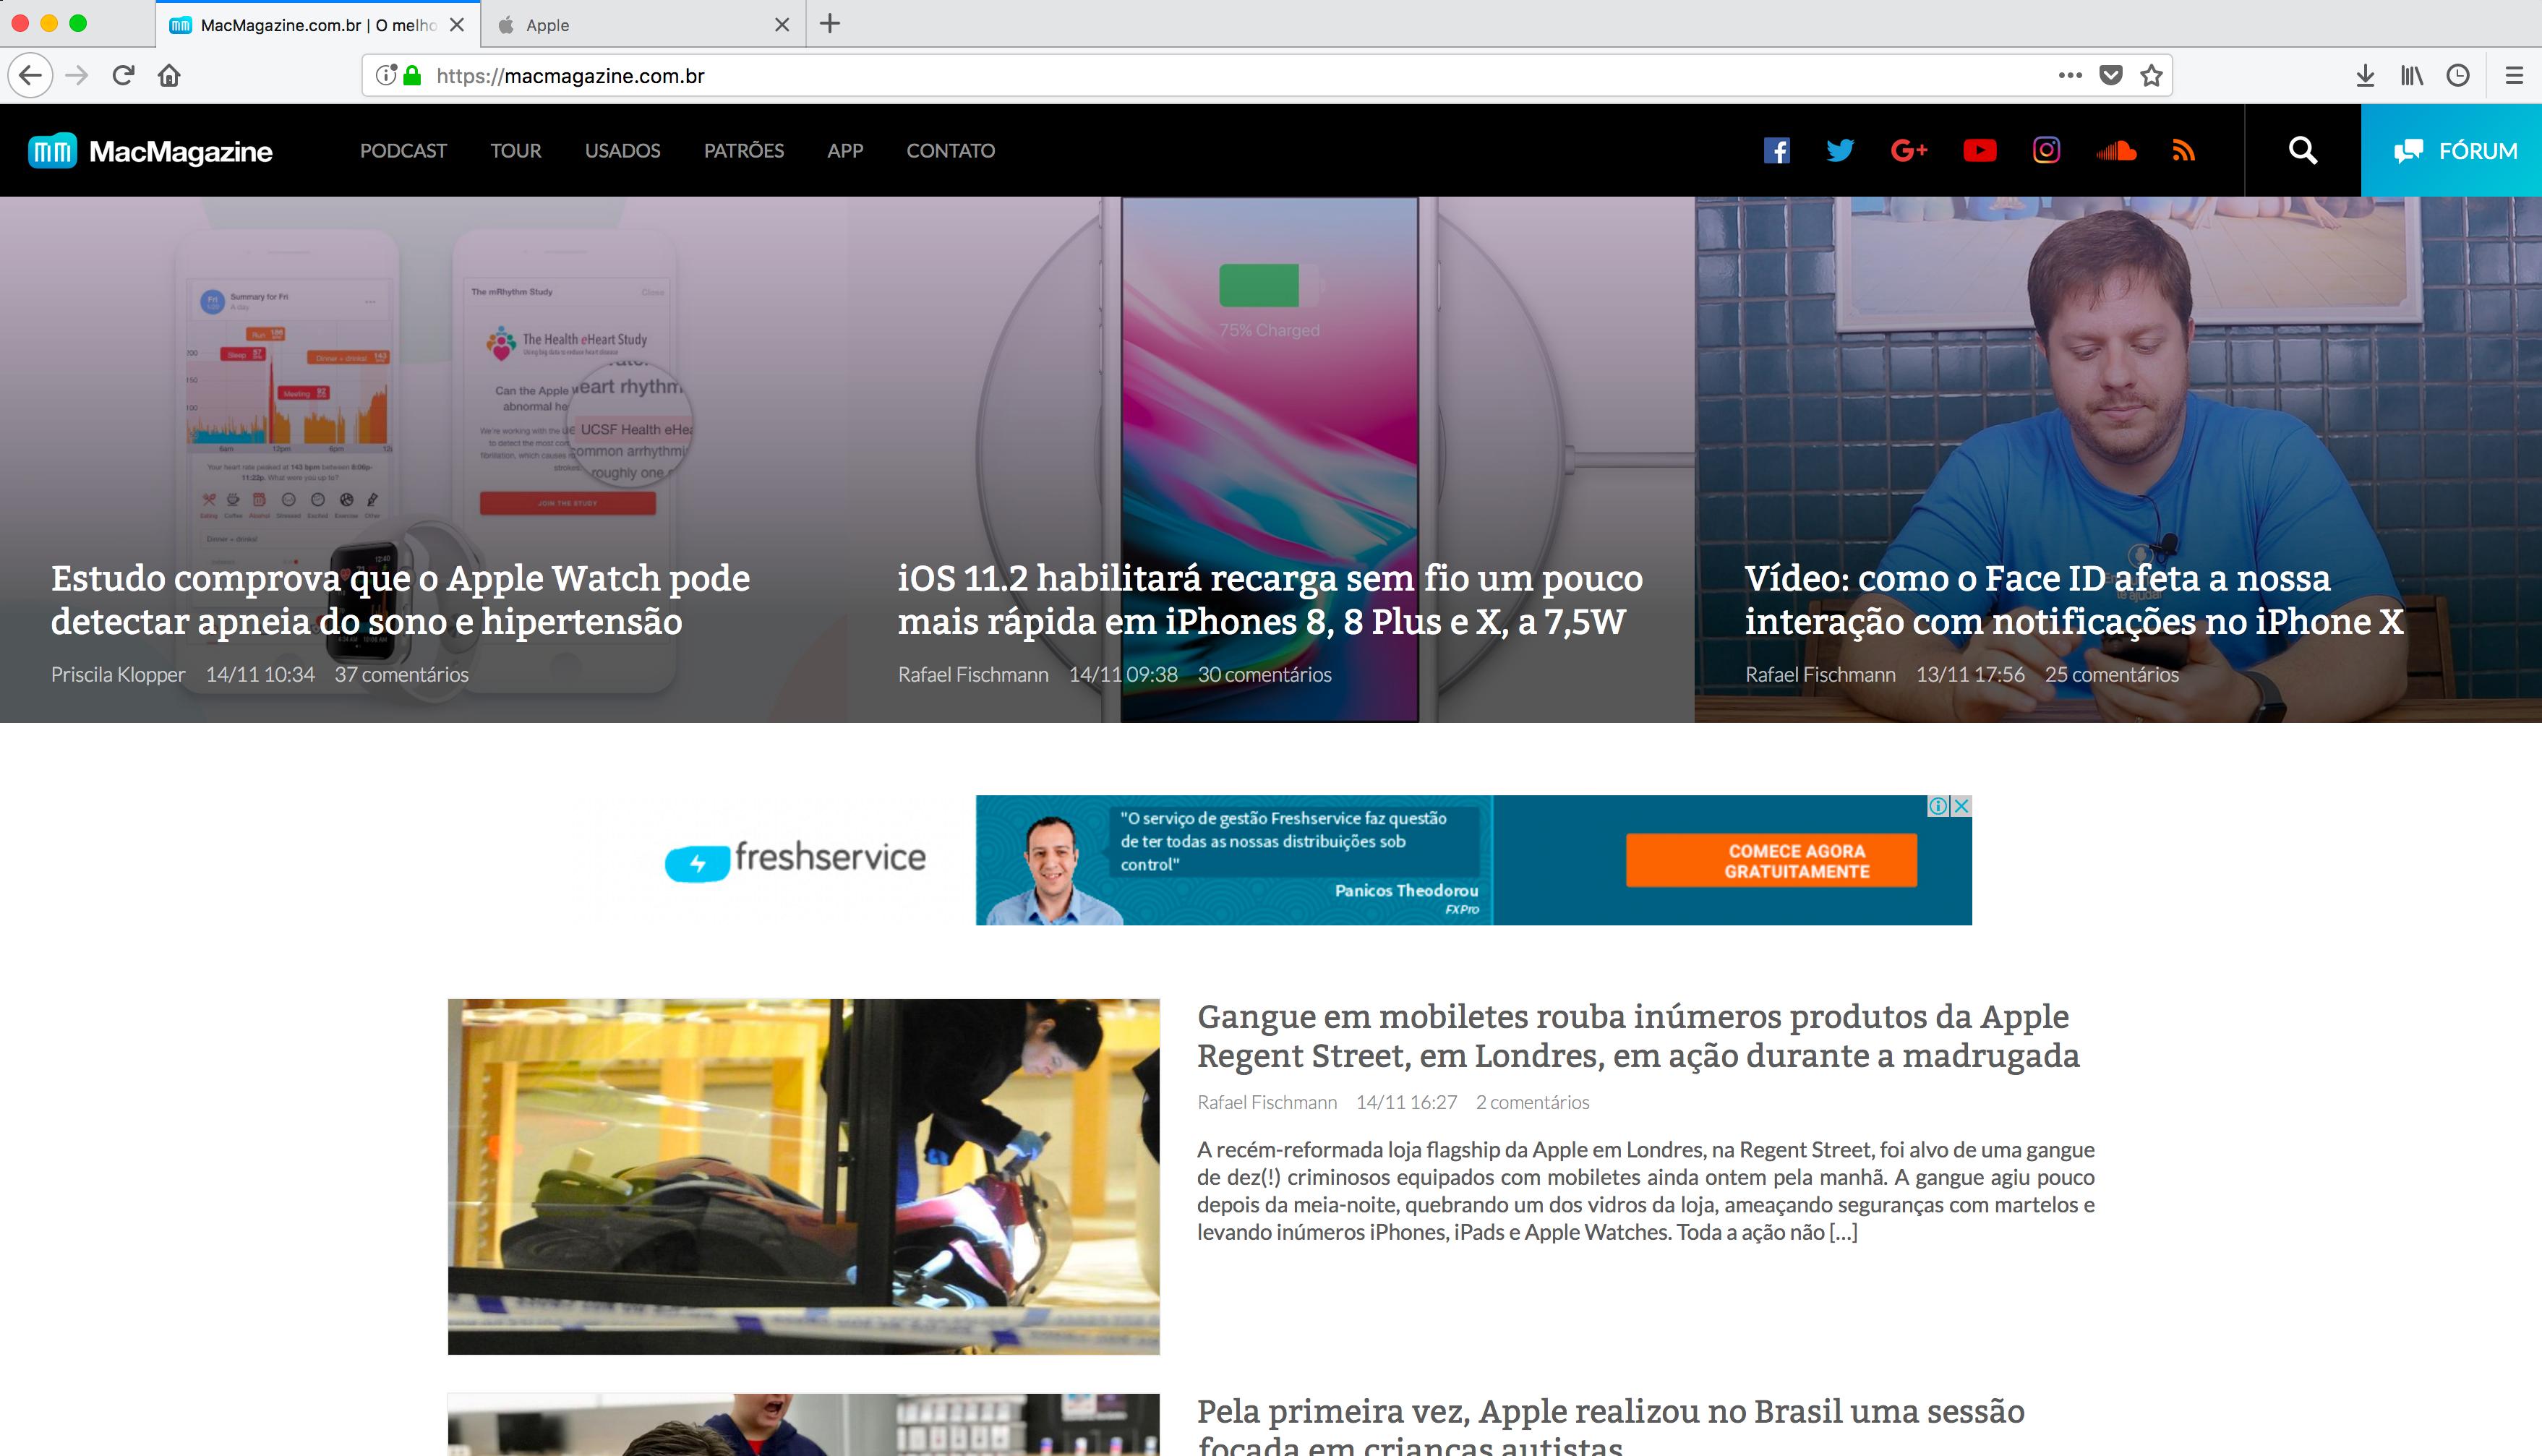 Firefox 57 Quantum no MacMagazine